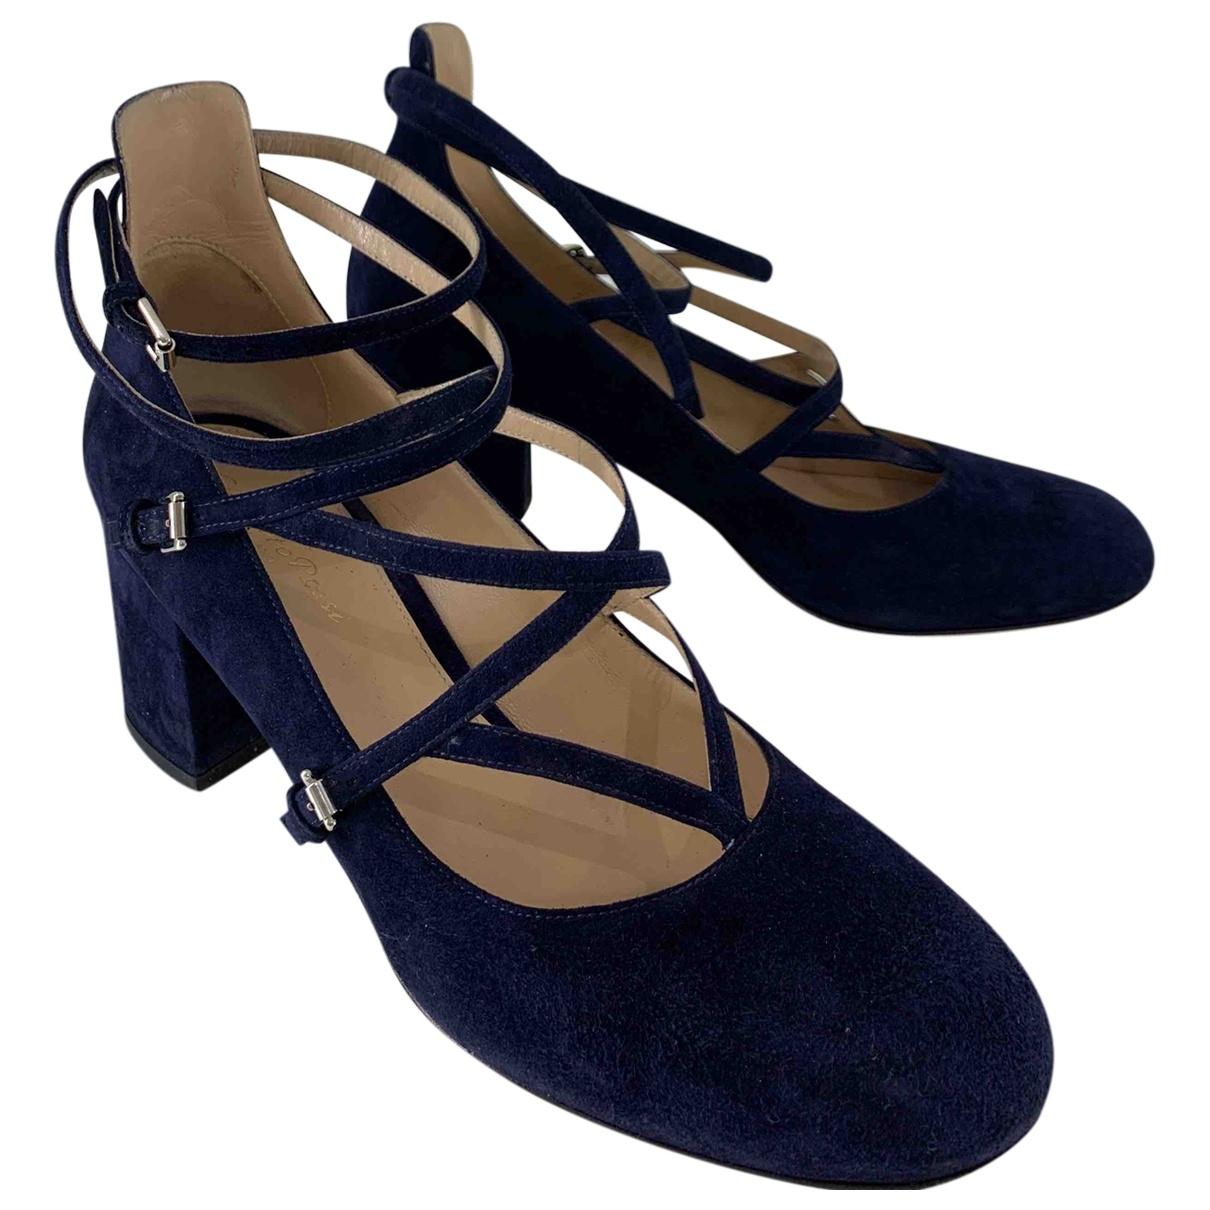 Gianvito Rossi - Escarpins   pour femme en suede - bleu